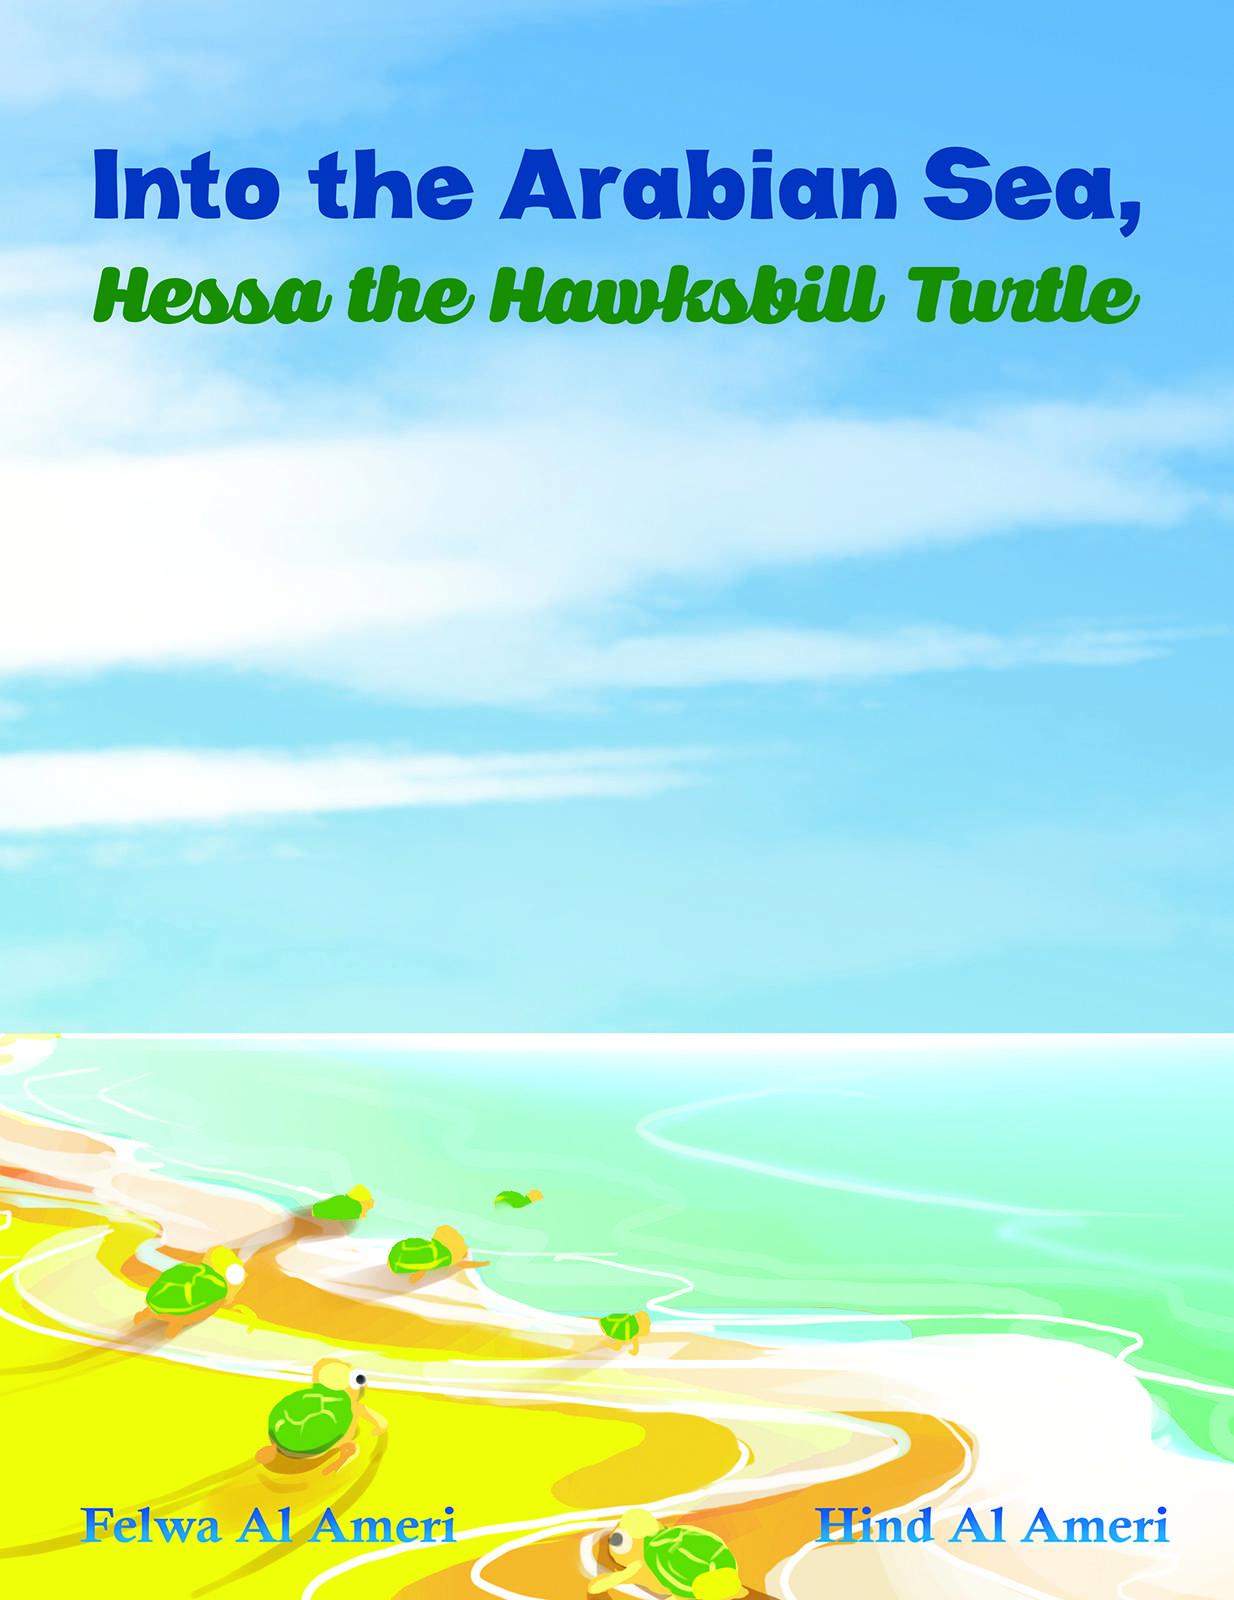 Into the Arabian Sea, Hessa the Hawksbill Turtle